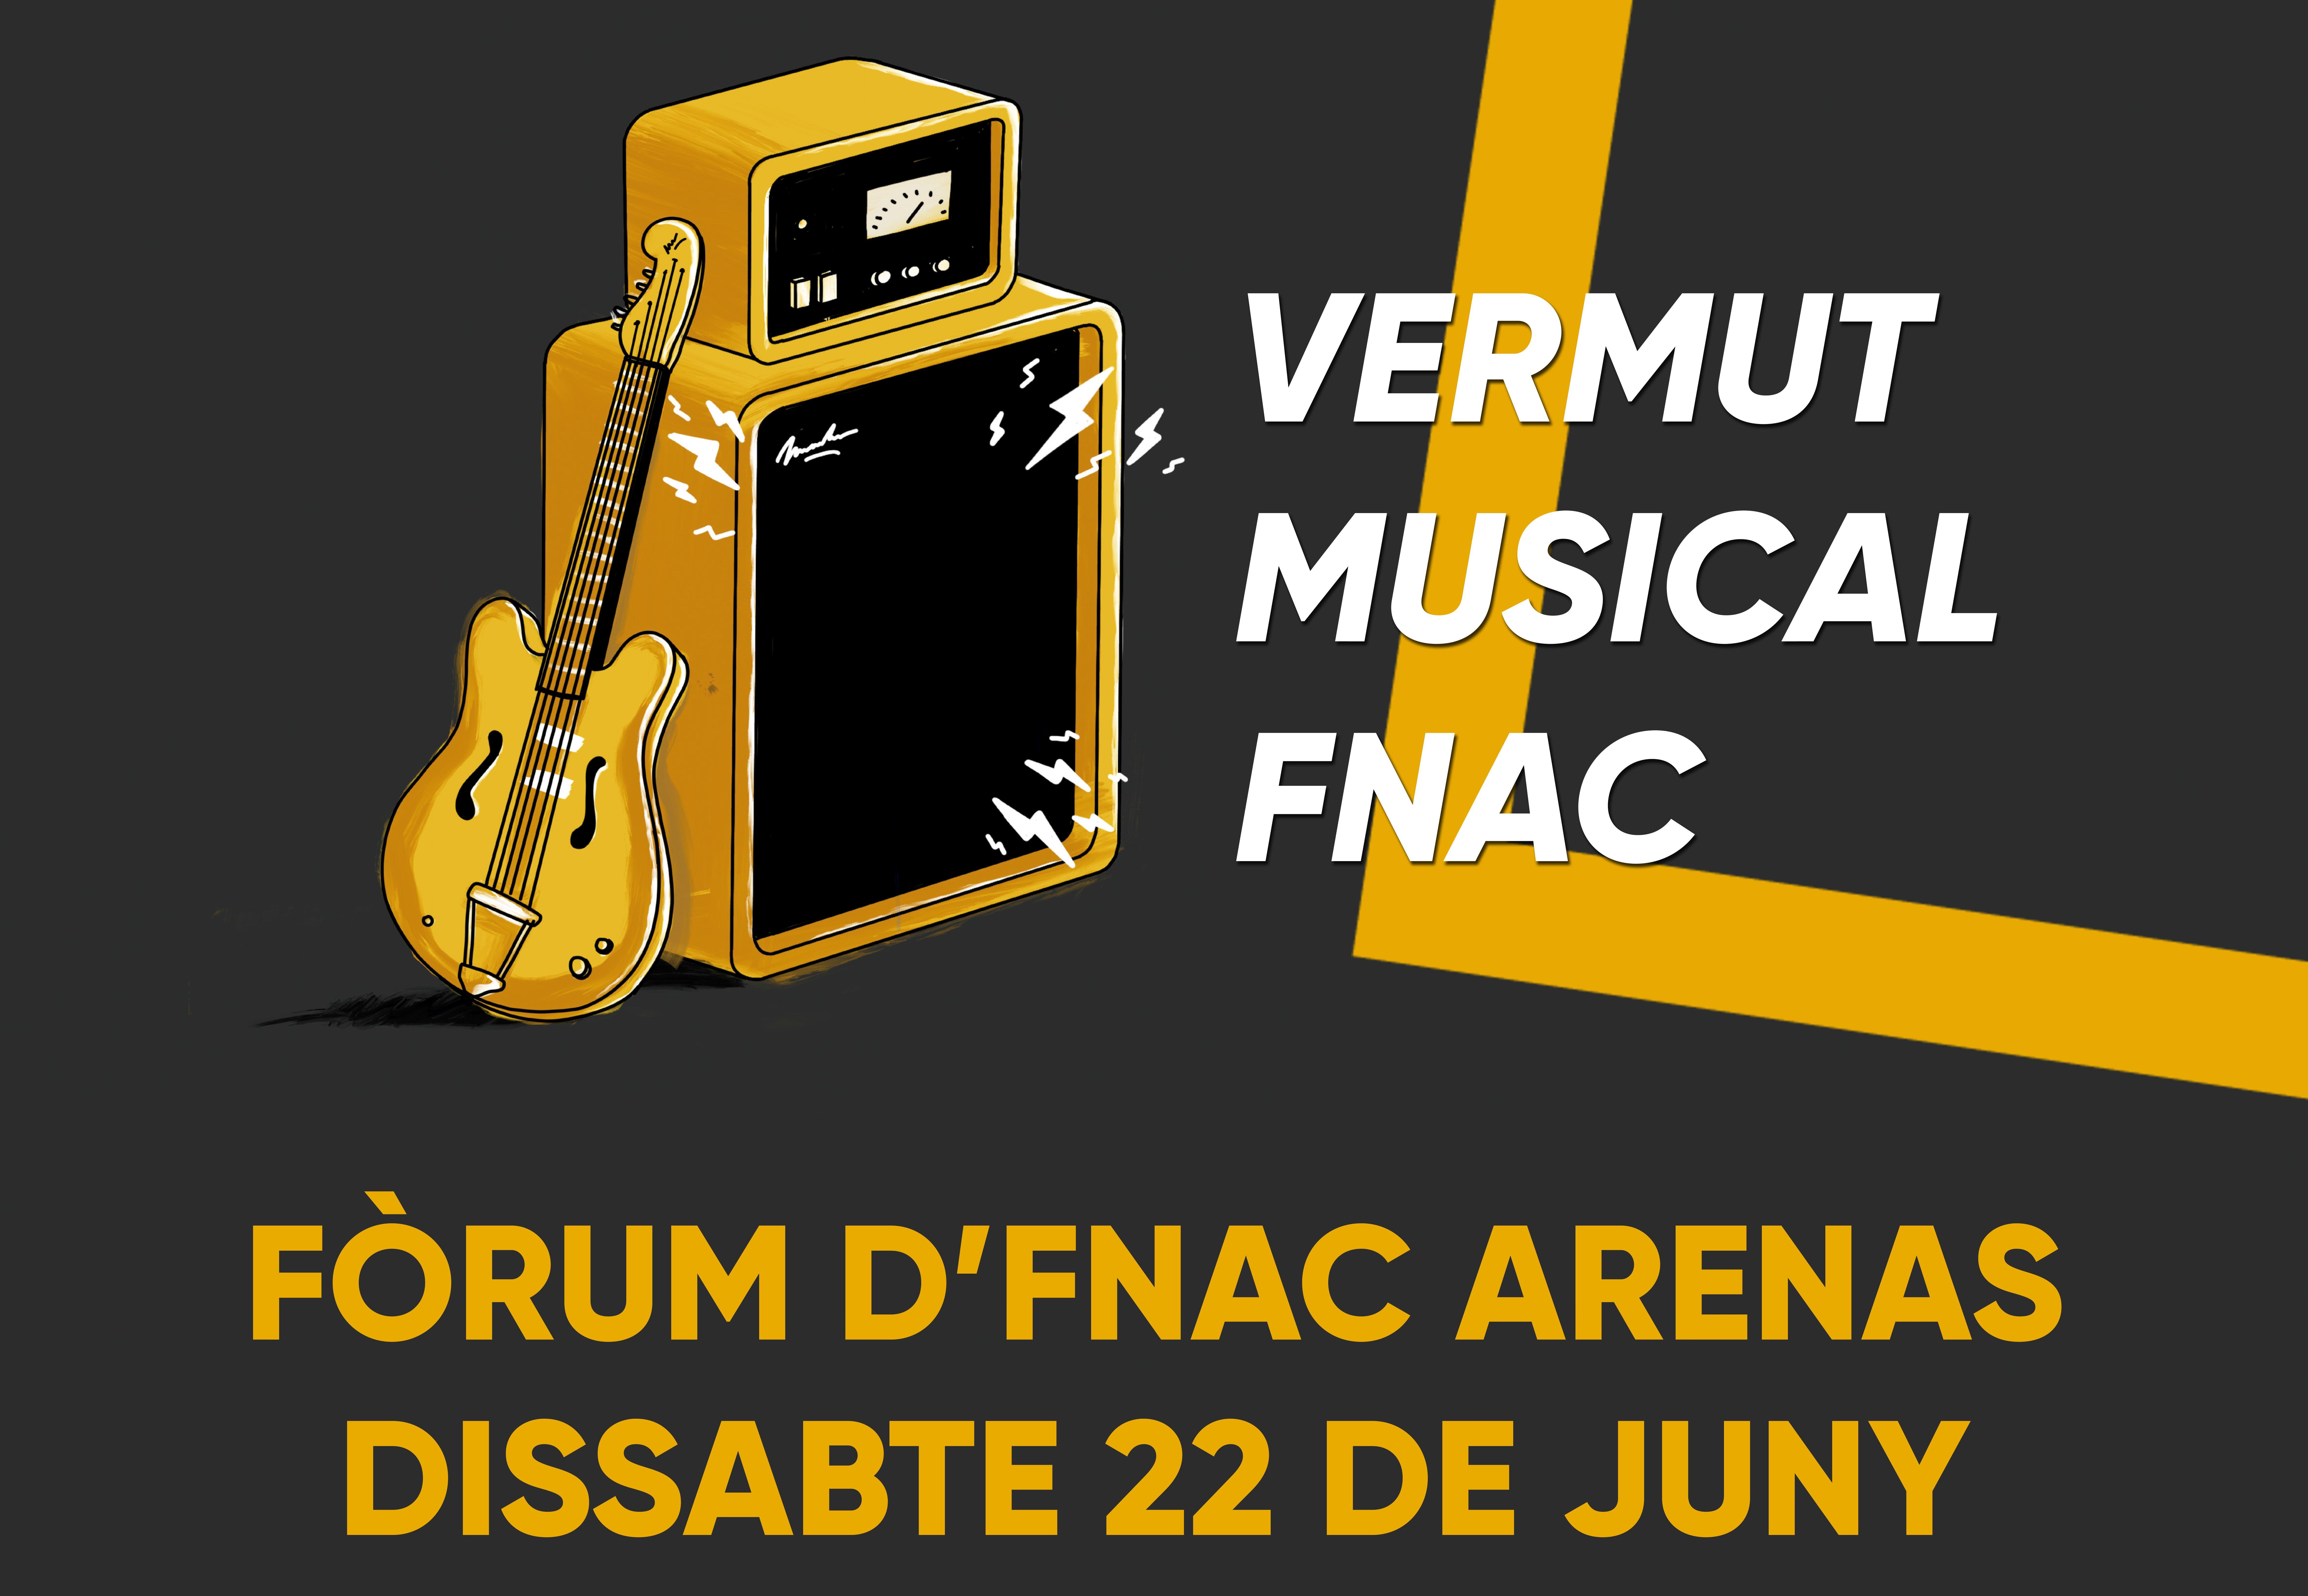 Vermut Musical Fnac